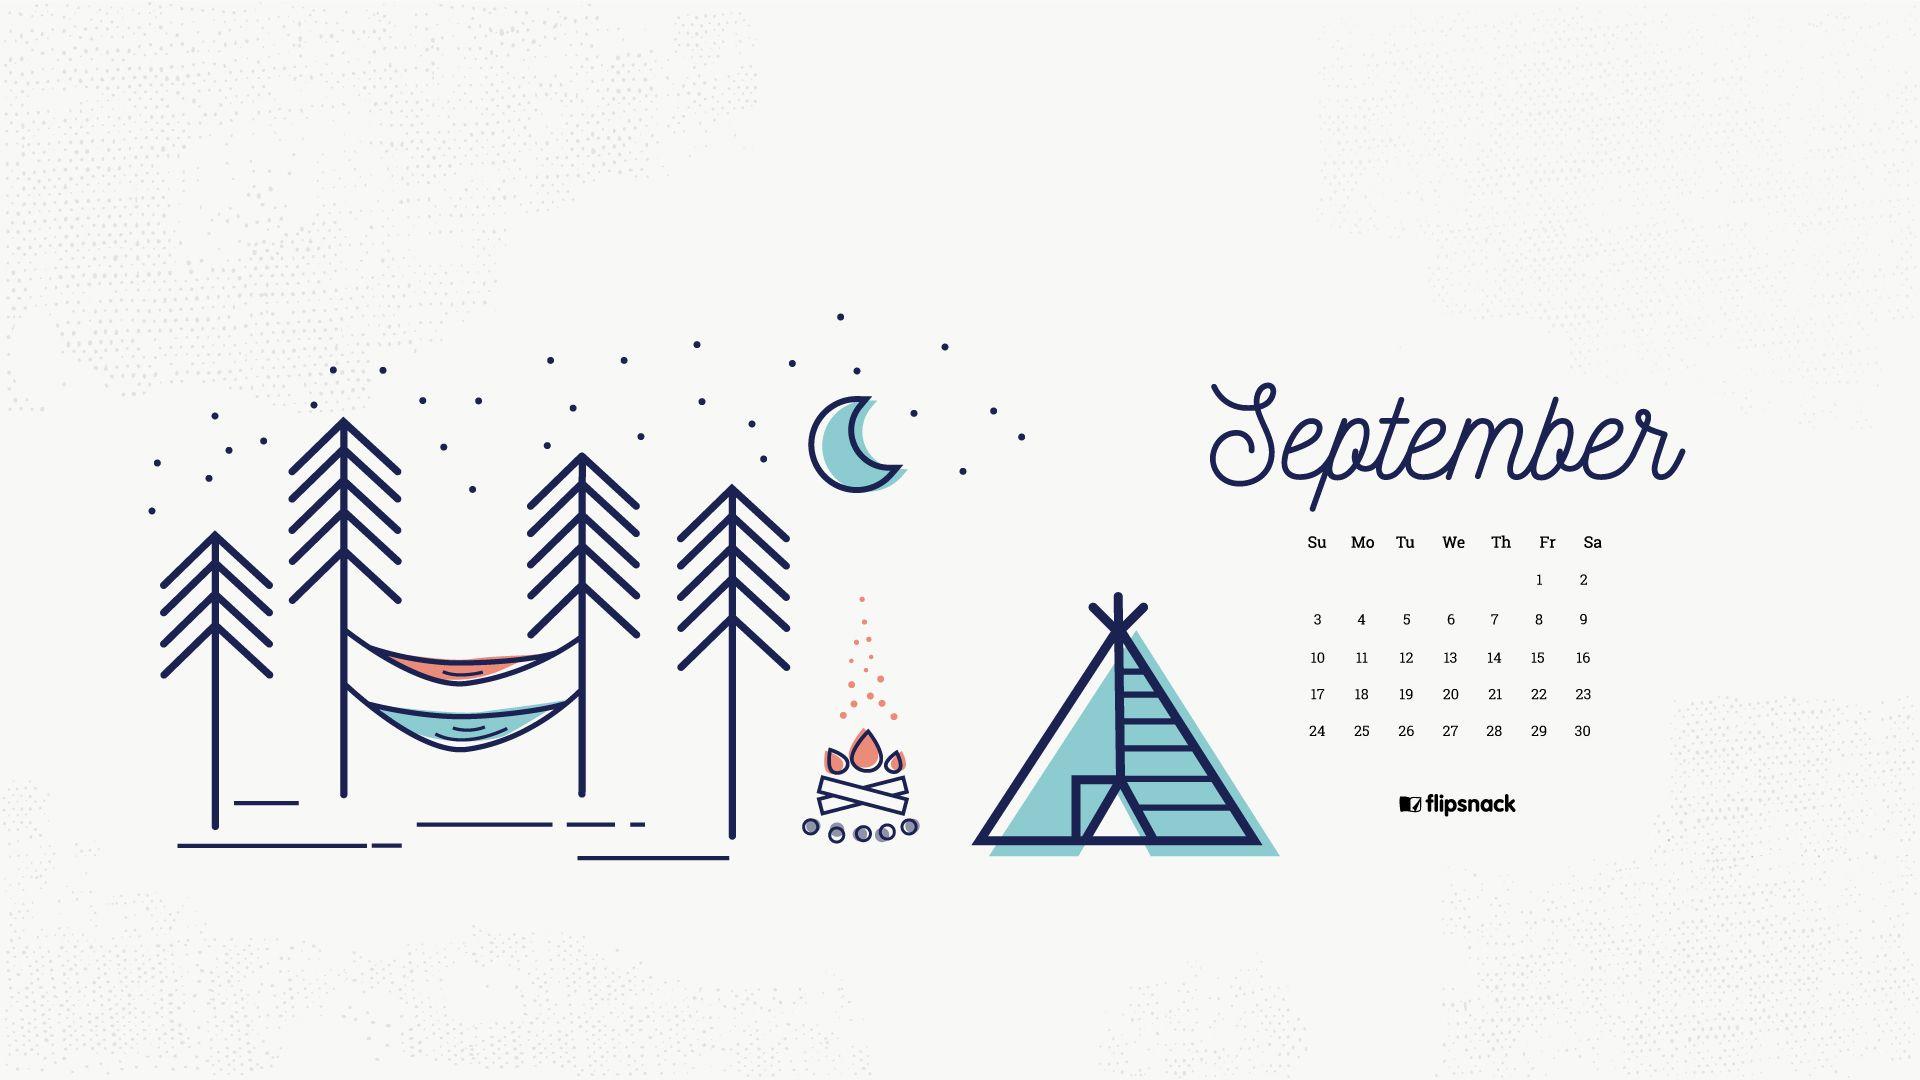 Your September 2017 Calendar Wallpaper Is Here Get It